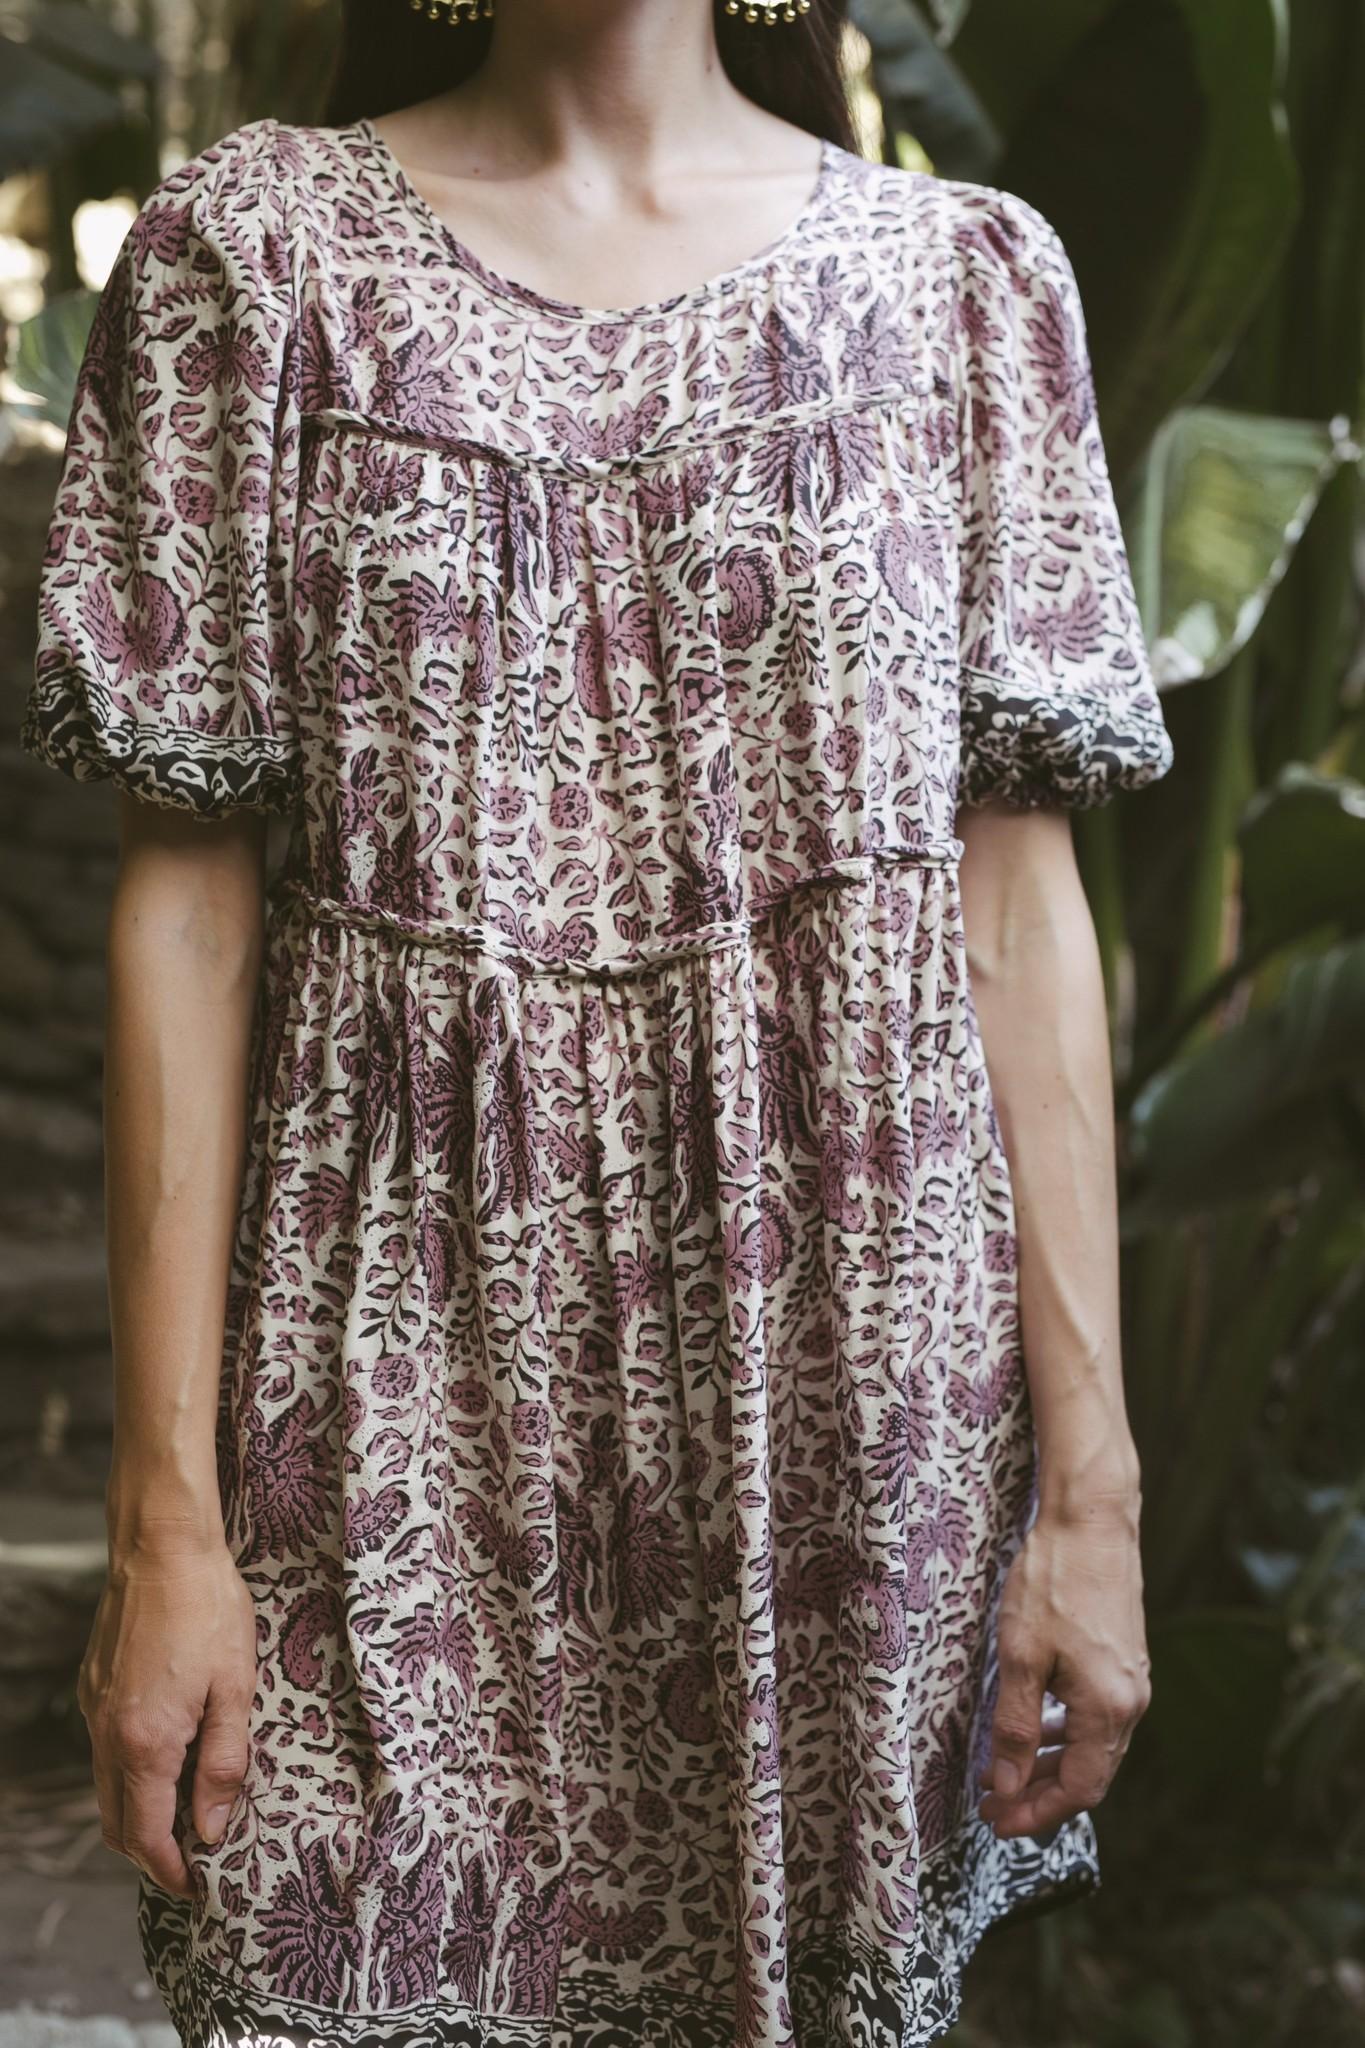 Natalie Martin Natalie Martin Haley Short Printed Dress